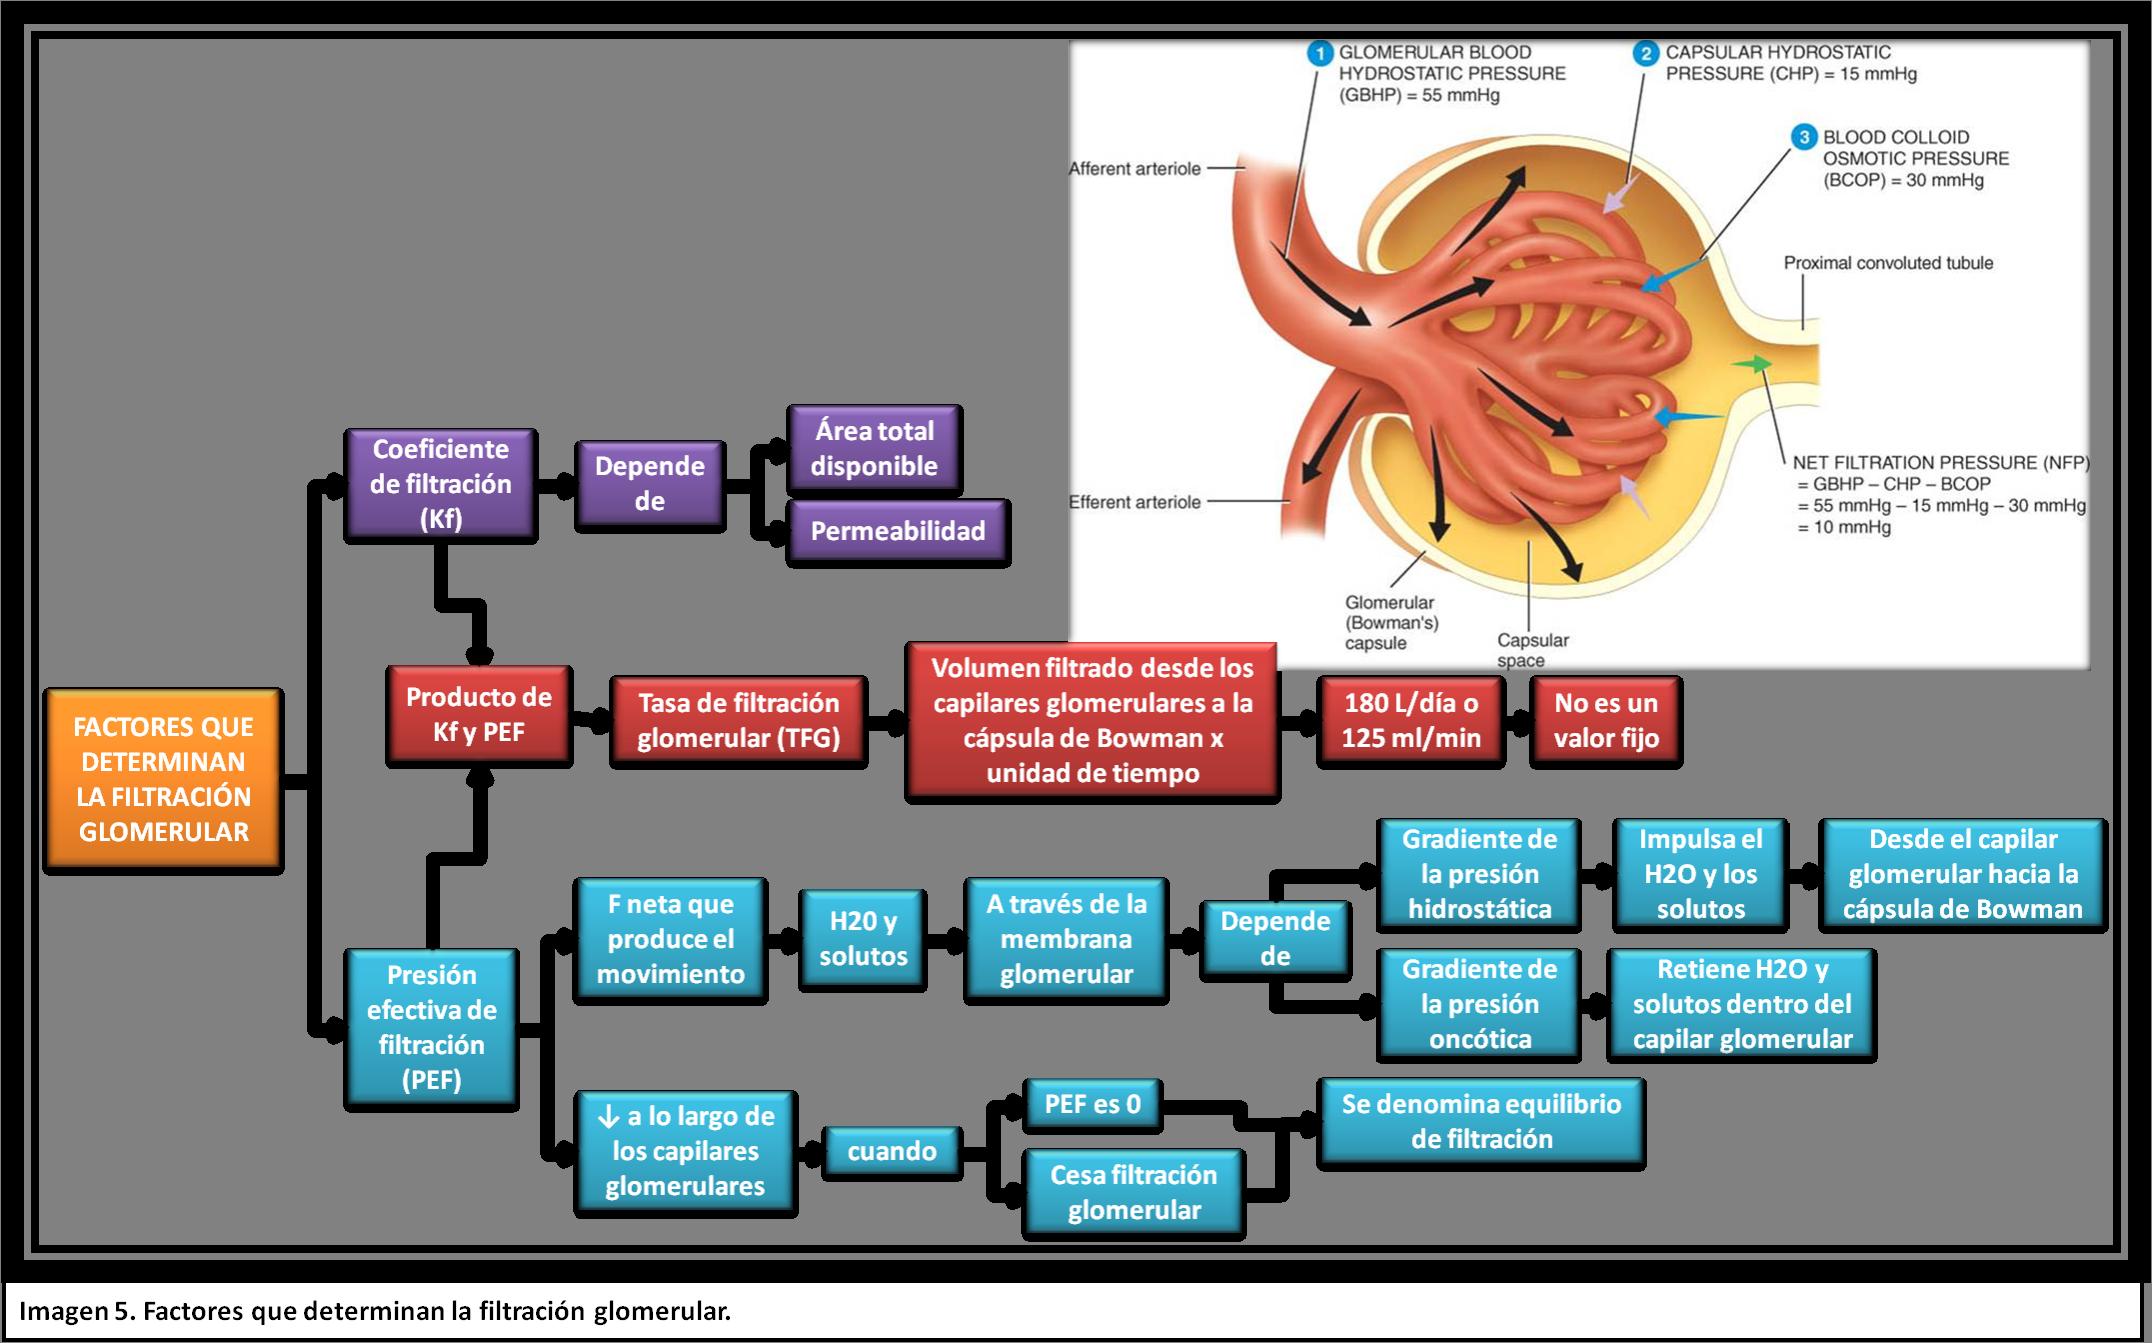 sistema renal fisiologia - Buscar con Google | FISIOLOGIA SISTEMA ...